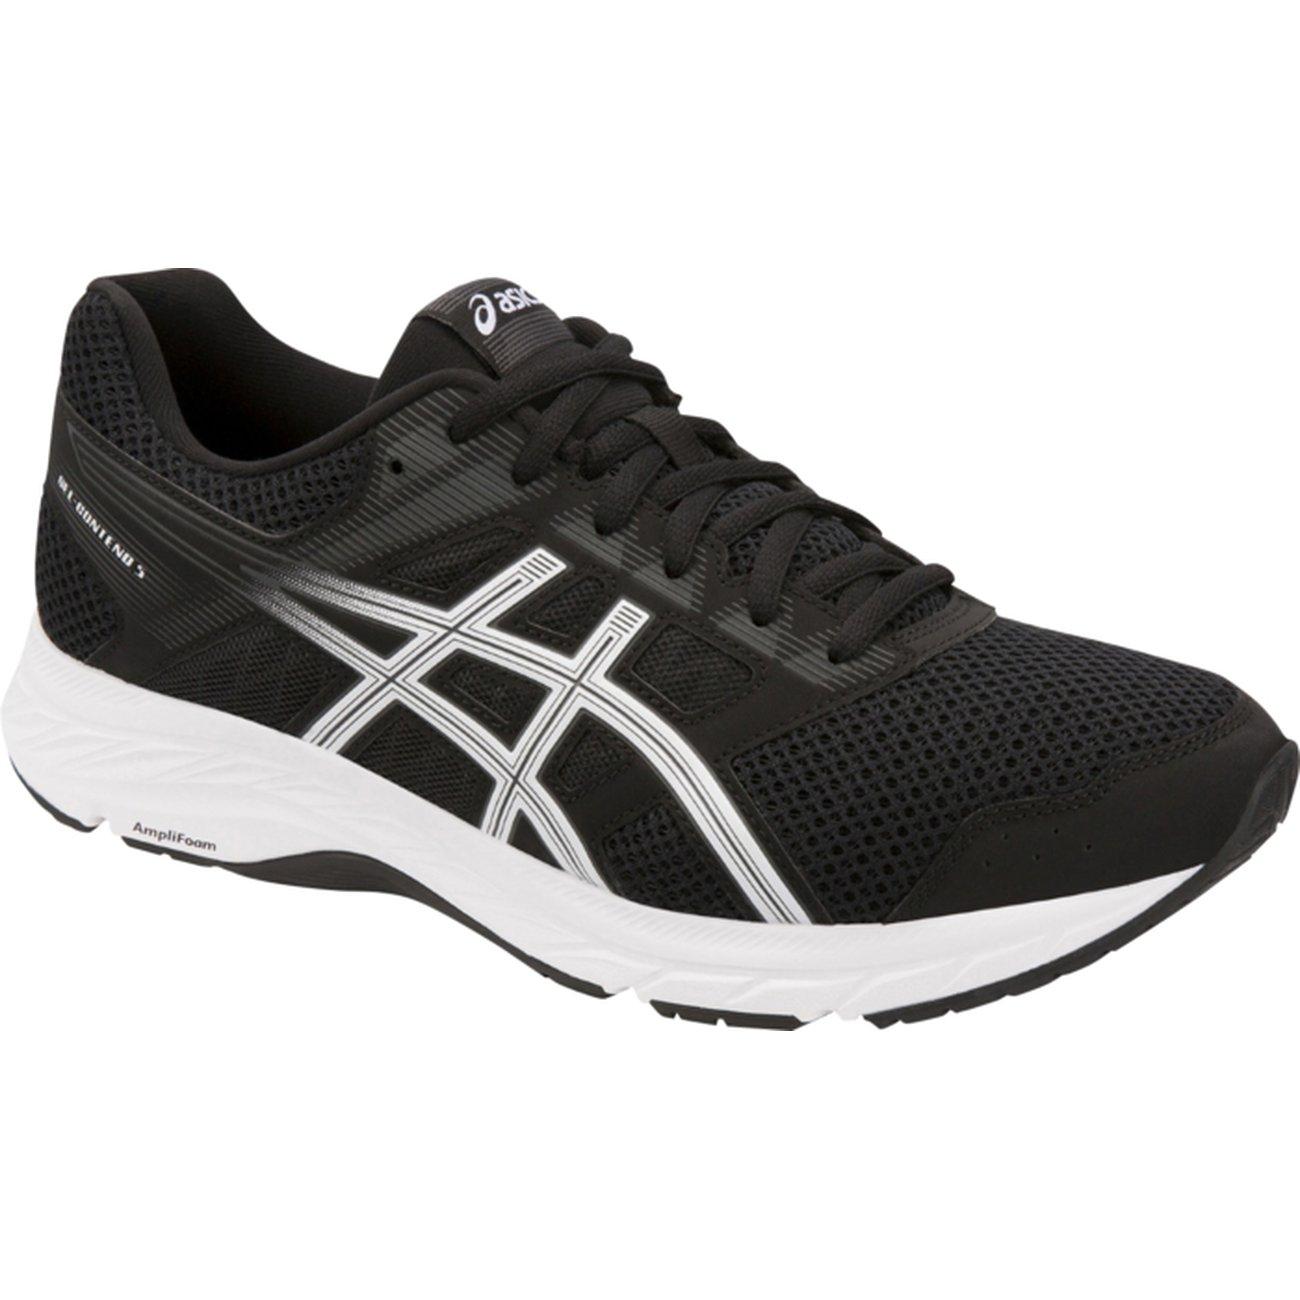 promo code 4bc06 9c5b5 Paire de chaussures de running ASICS GEL-CONTEND 5 - Noir